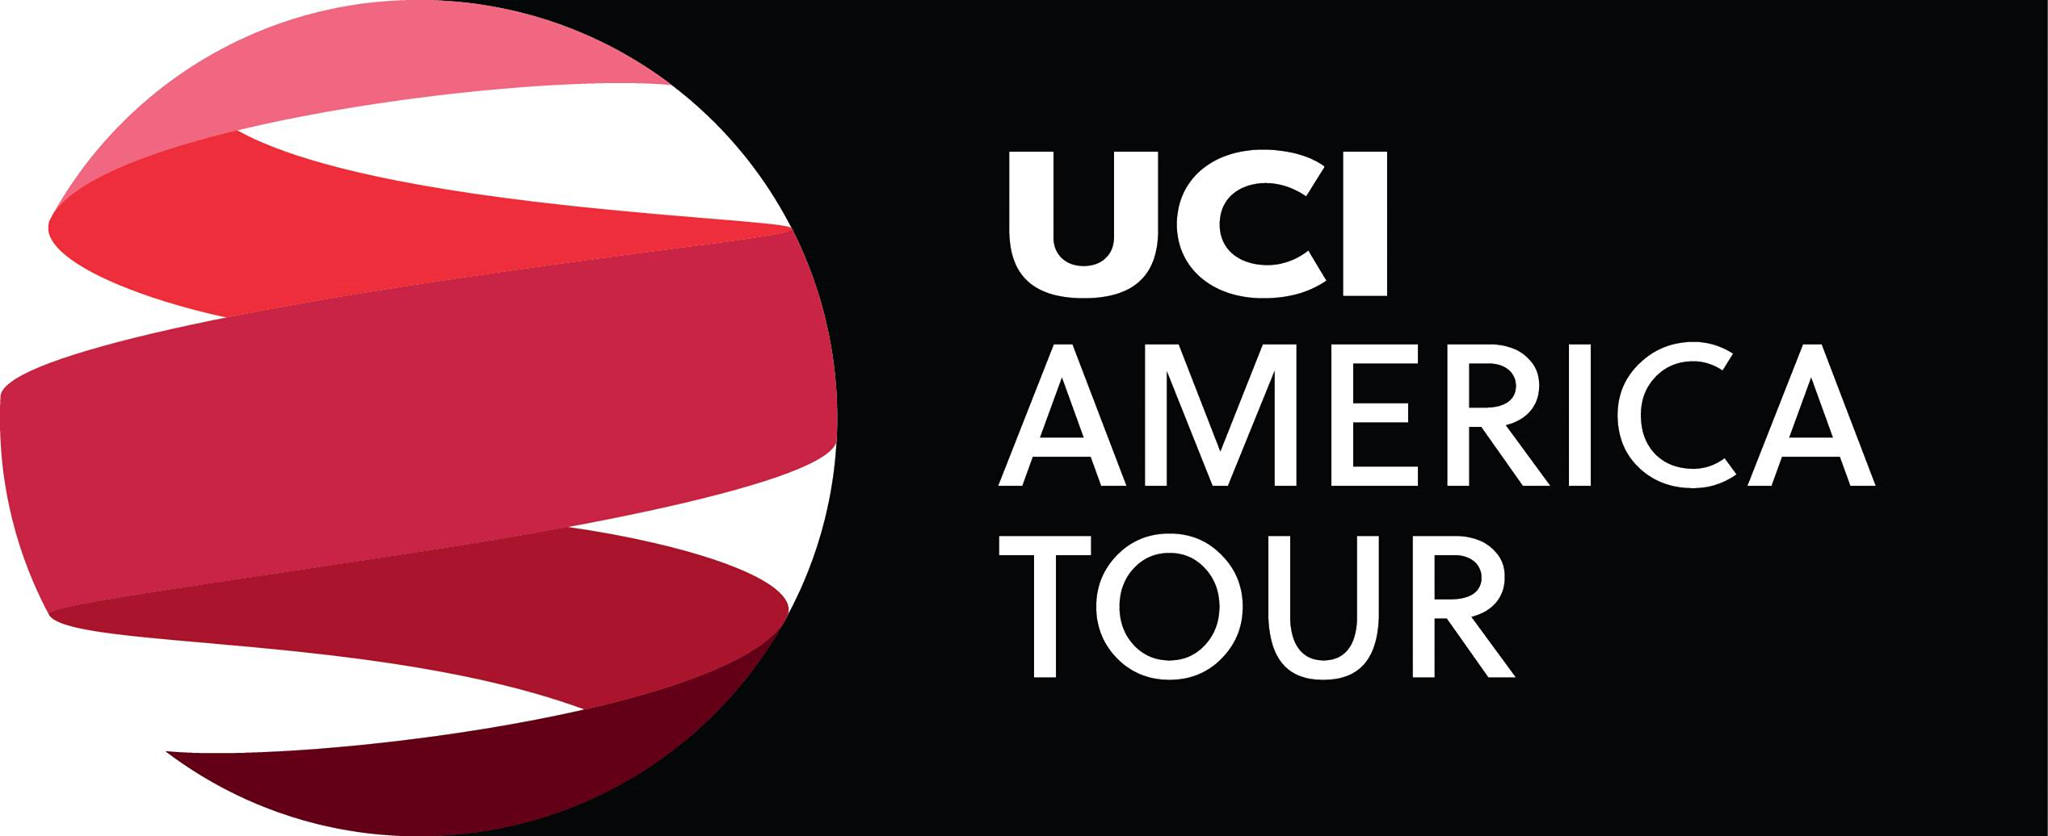 uci america logo 2016